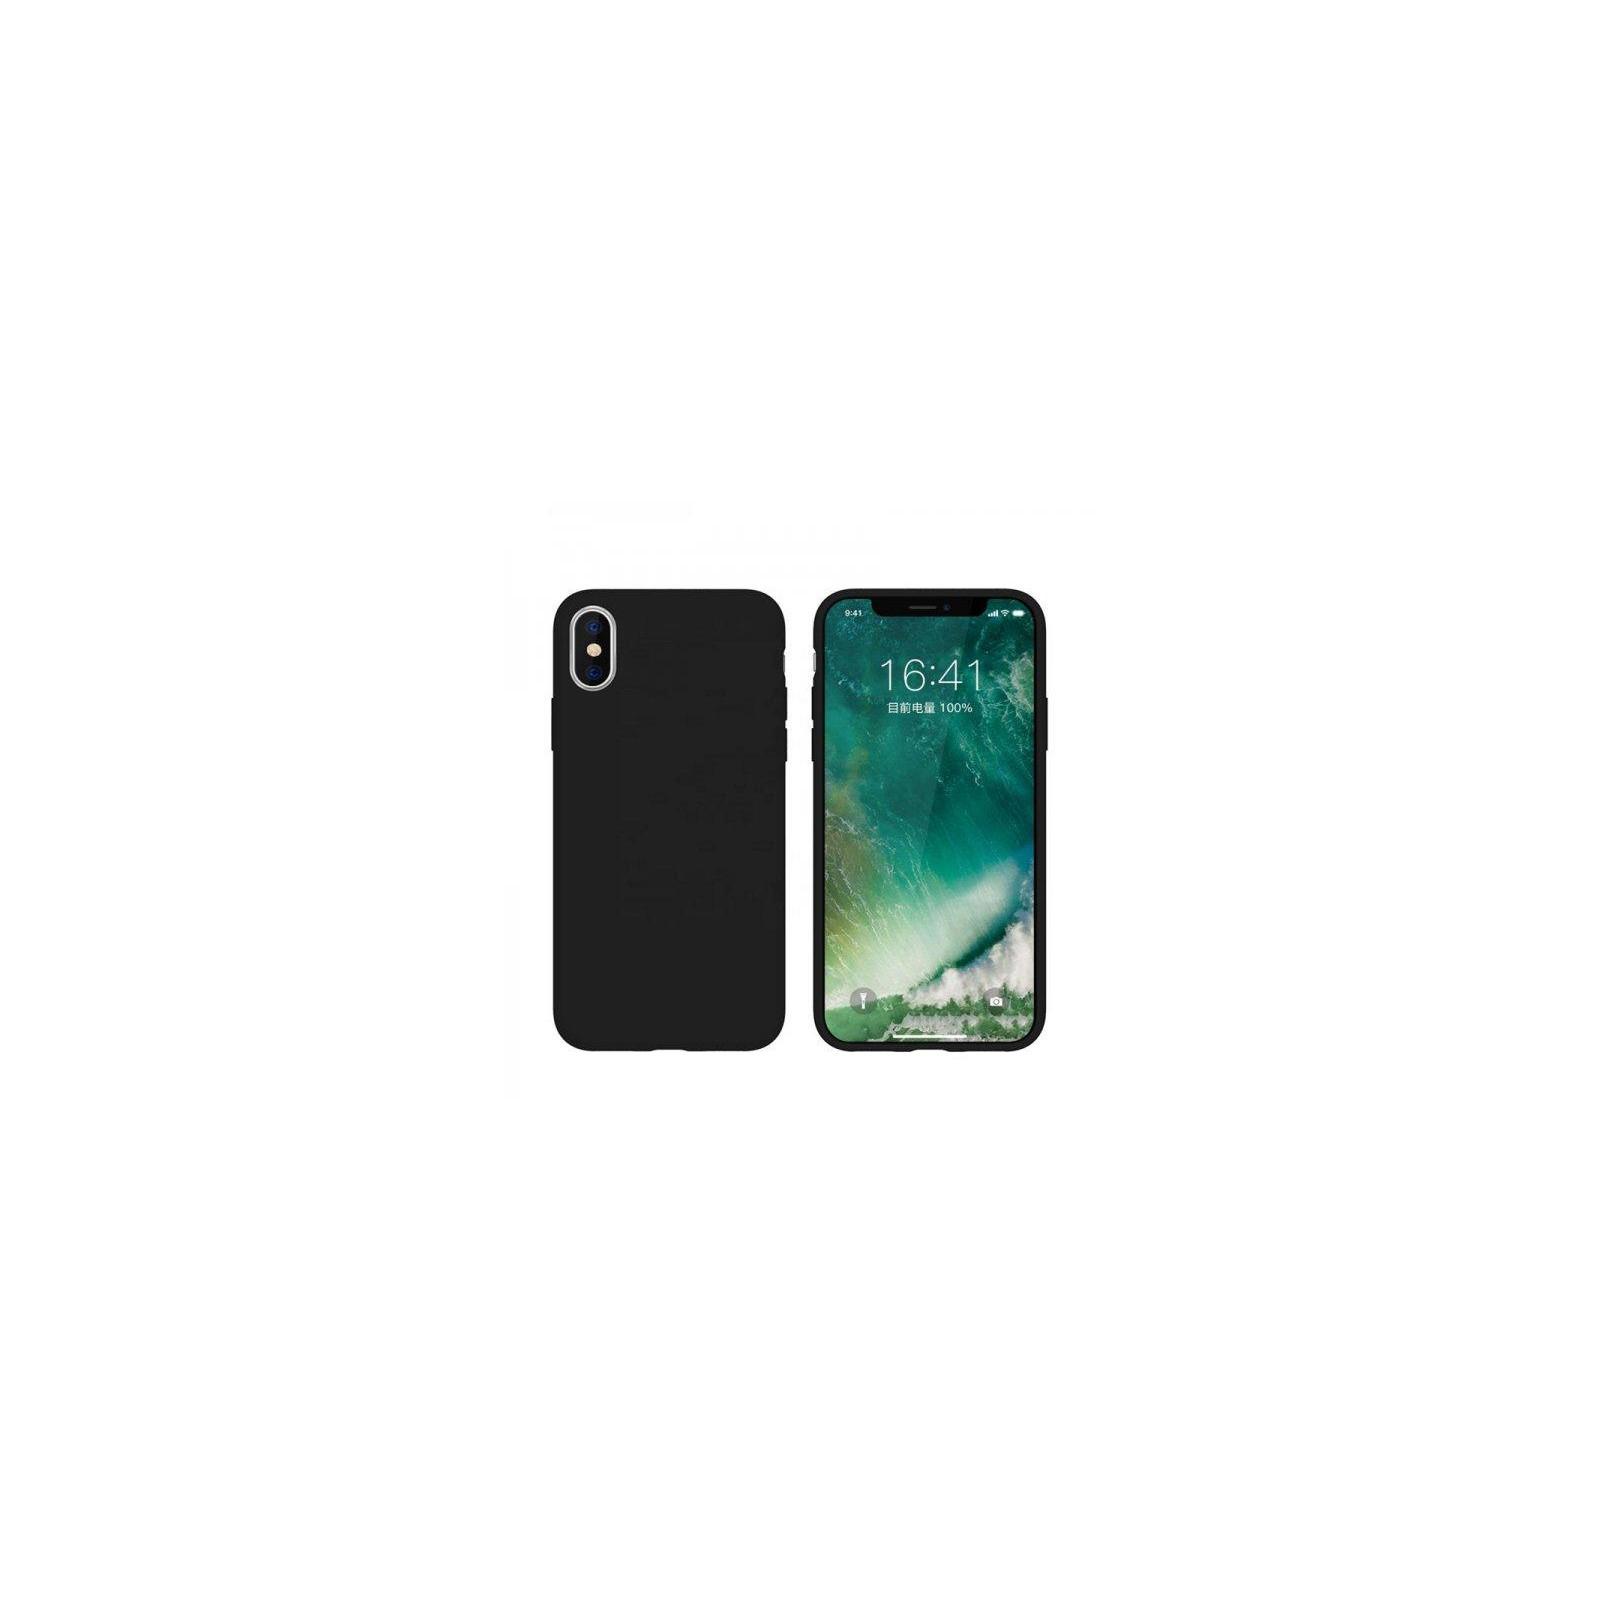 Чохол до моб. телефона 2E Basic Samsung Galaxy A21, Soft feeling, Black (2E-G-A21-NKSF-BK)